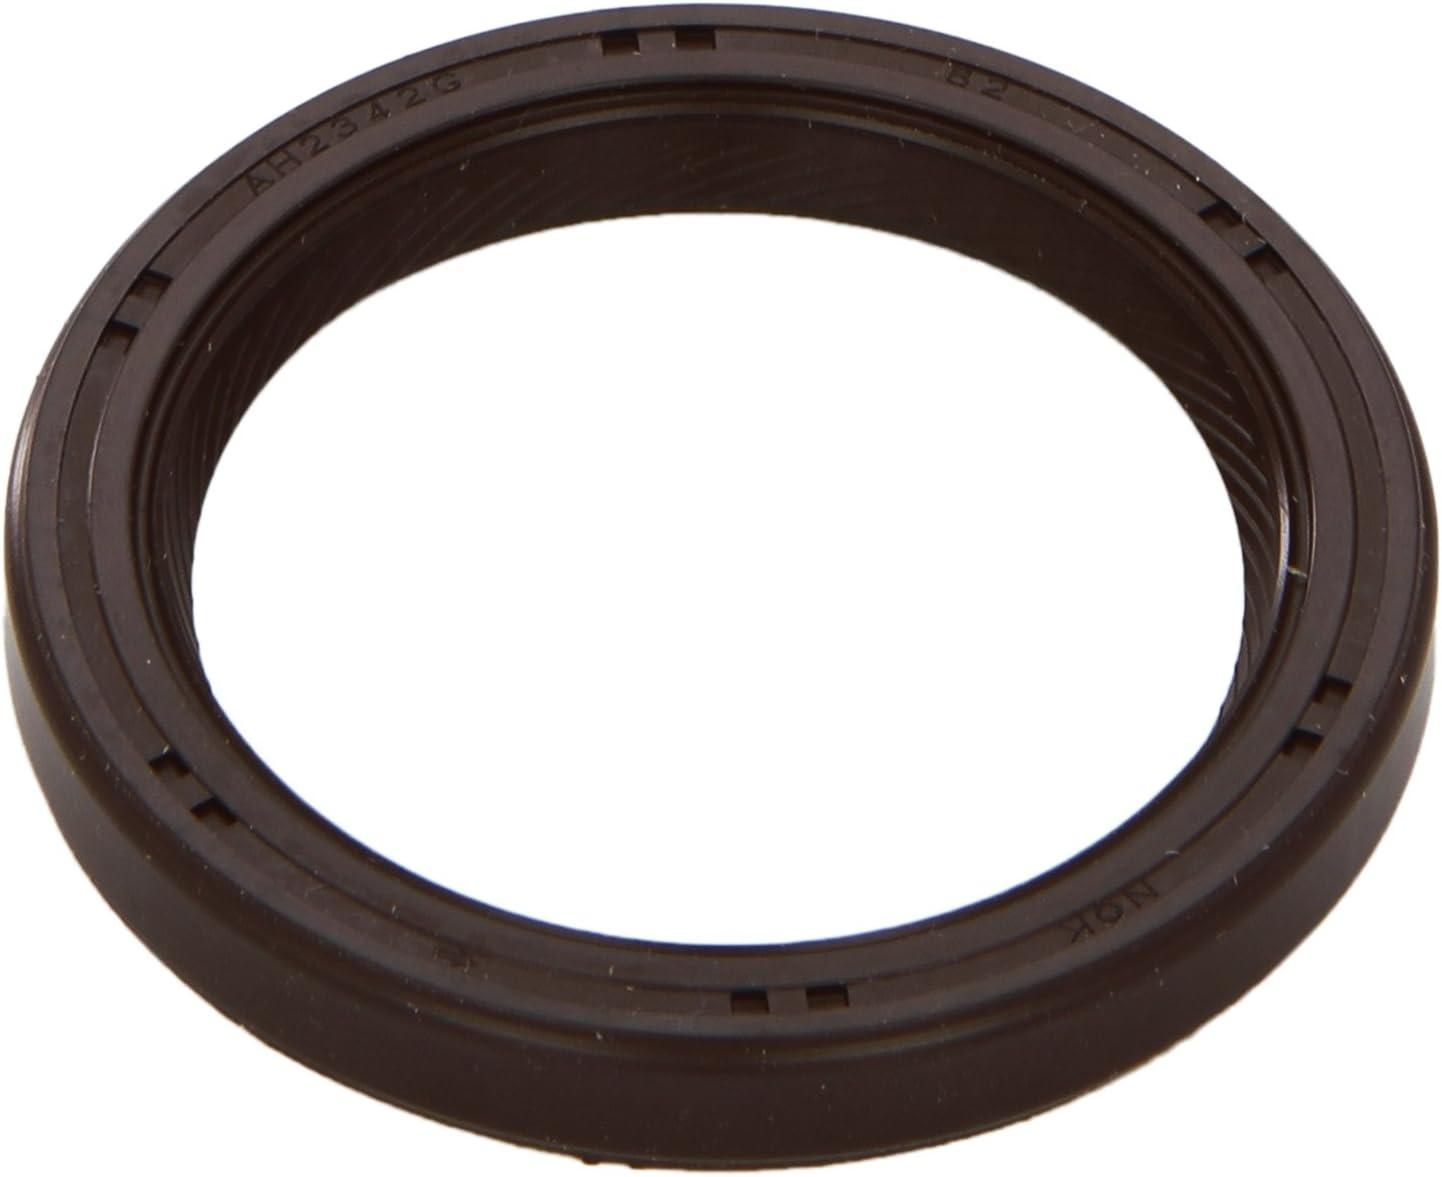 Corteco 19026258B Oil Seal Crankshaft